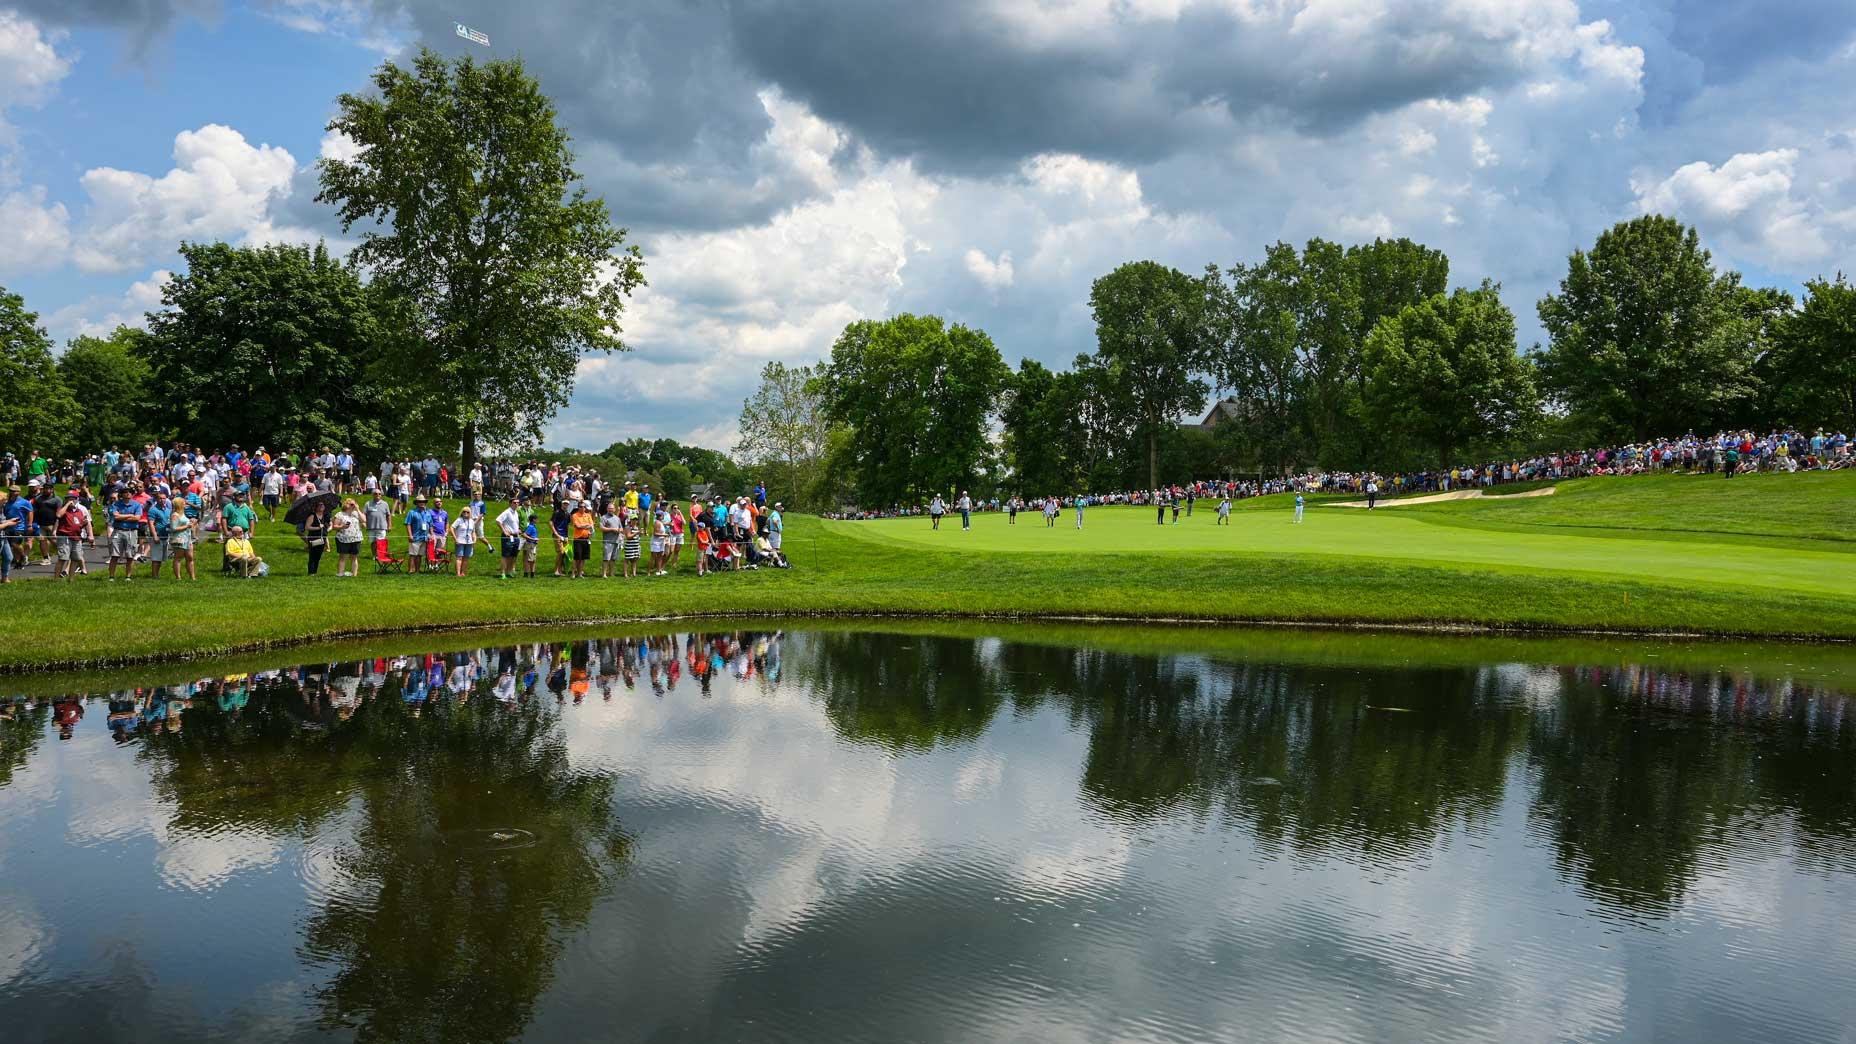 The par-4 6th hole at Muirfield Village Golf Club in 2019.